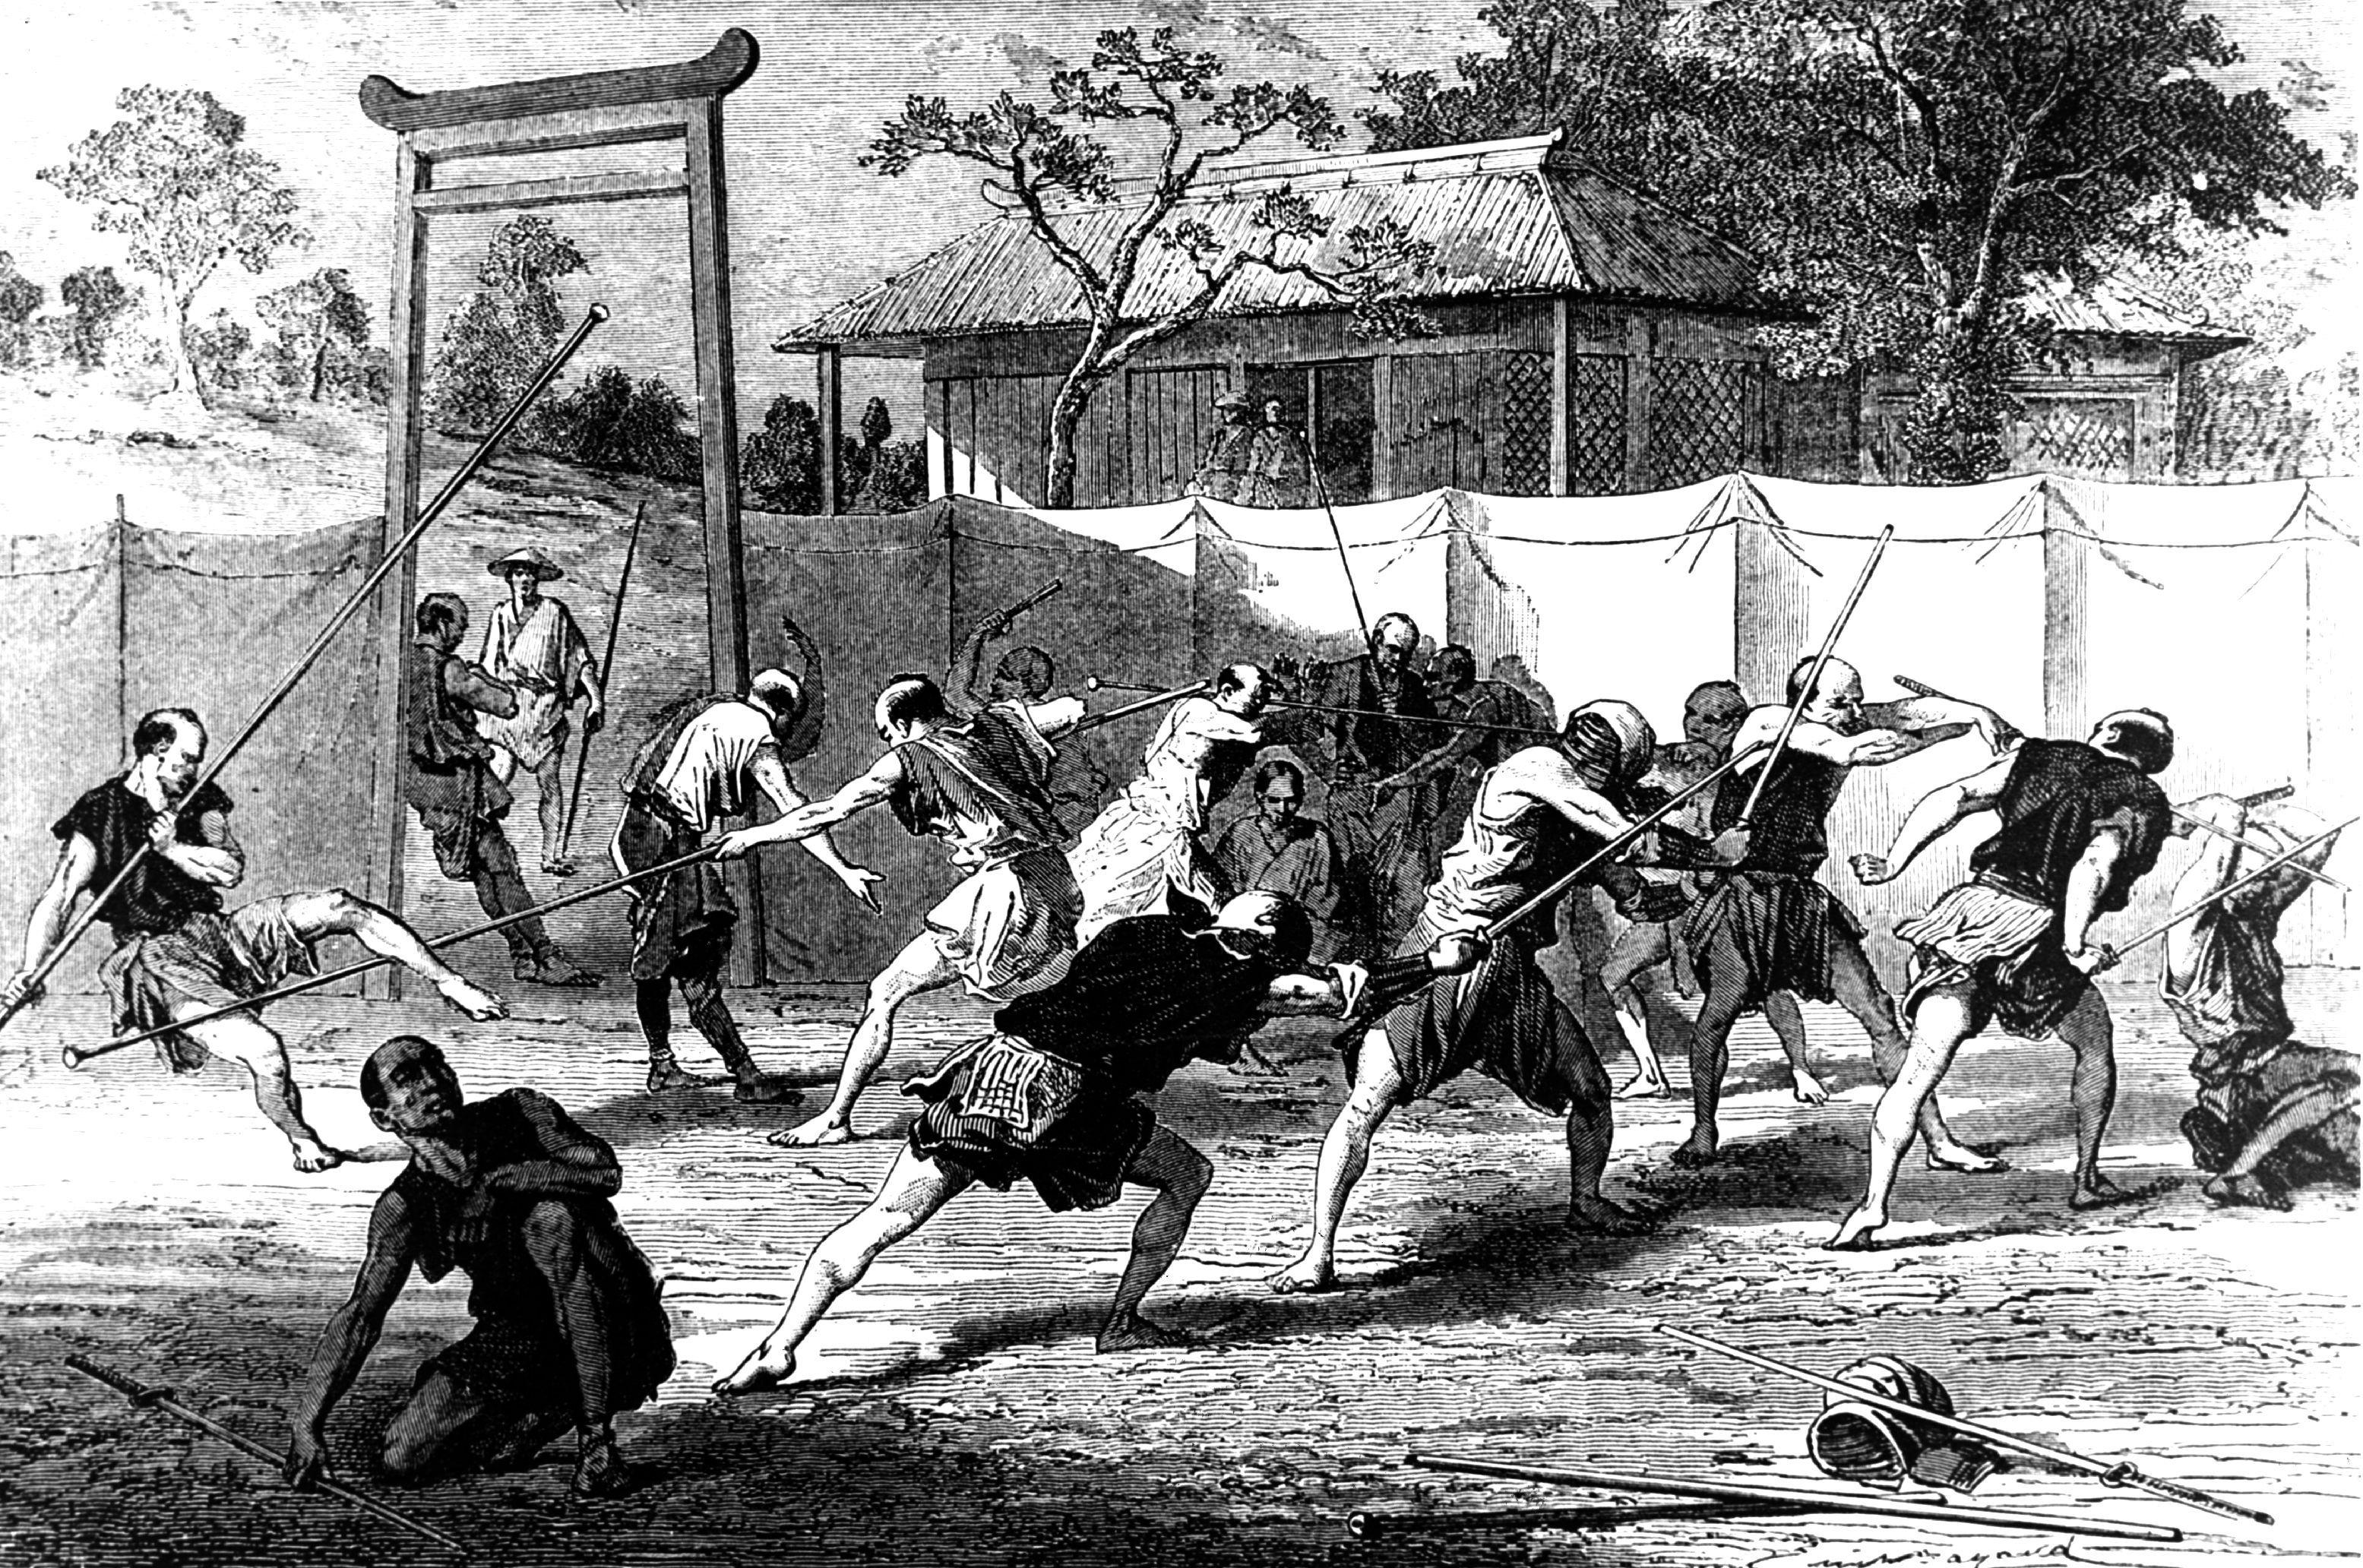 Illustration of samurai recruits training for the Satsuma Rebellion